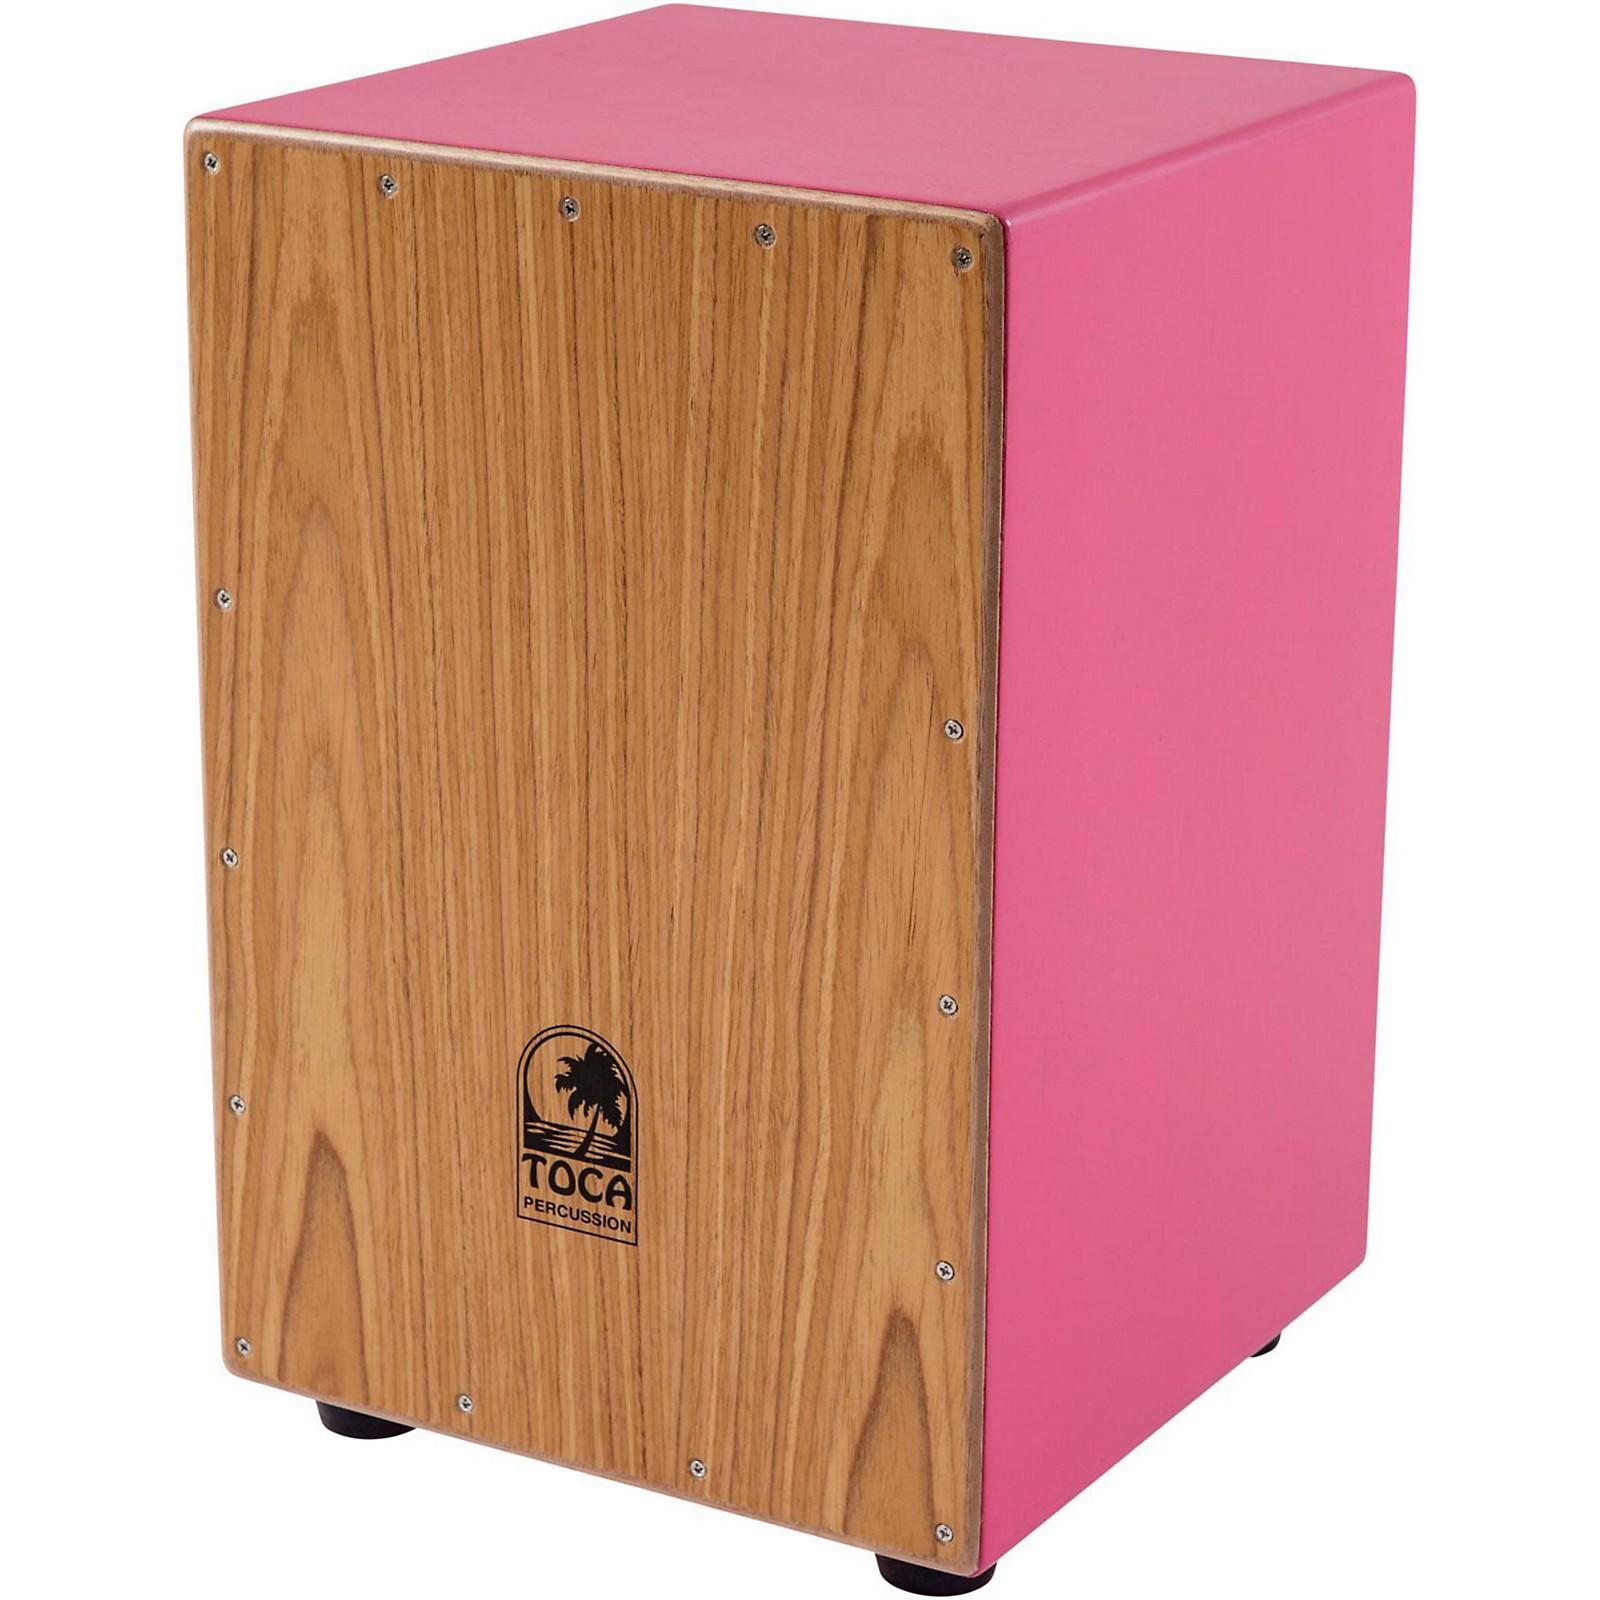 Open Box Toca Colorsound Cajon